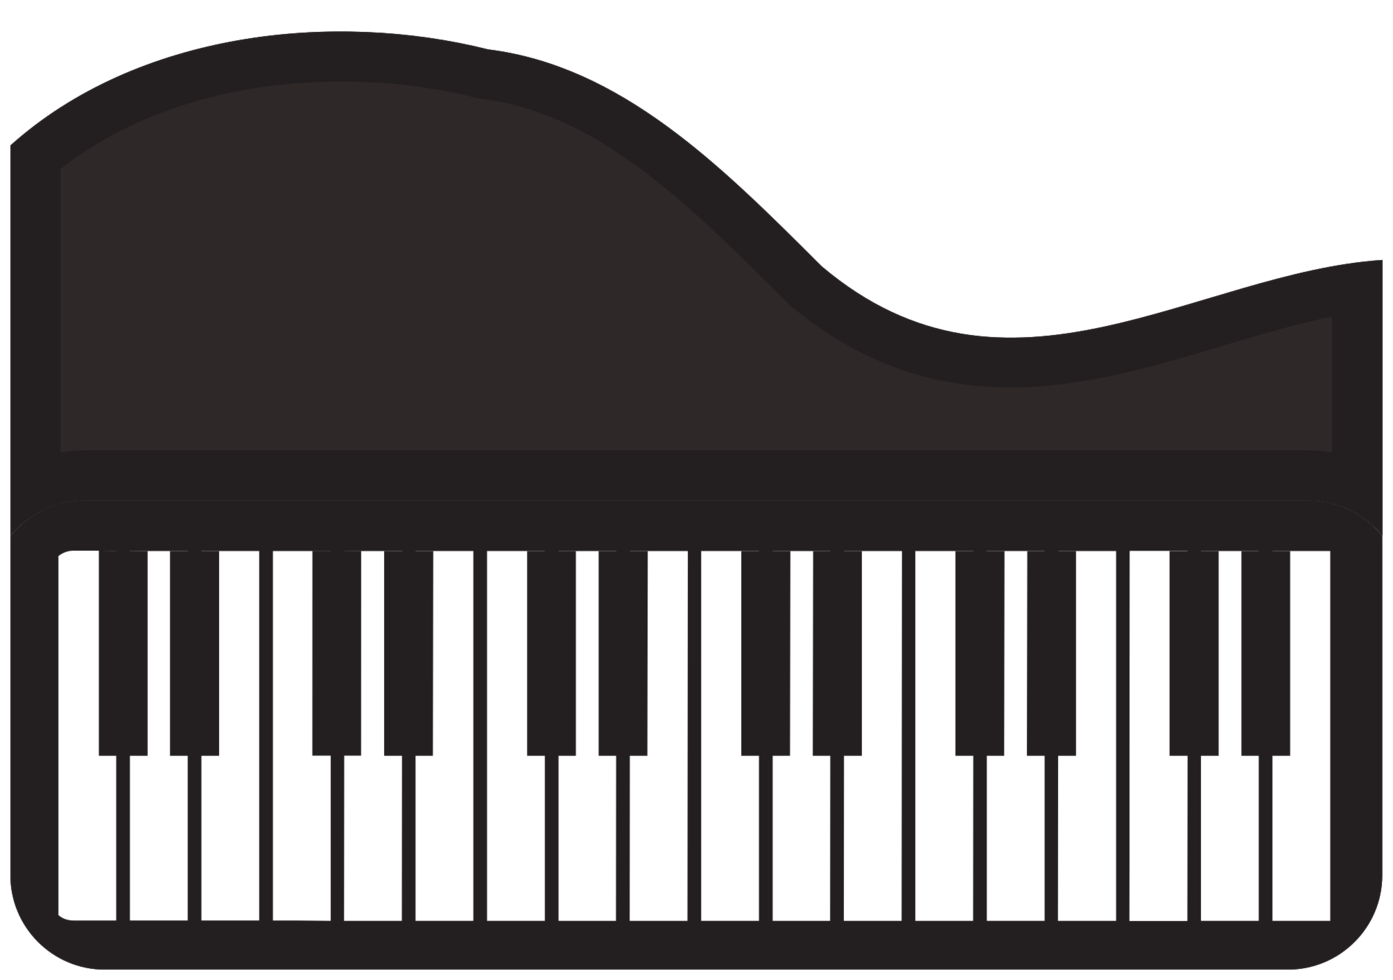 instrument de musique piano à queue png